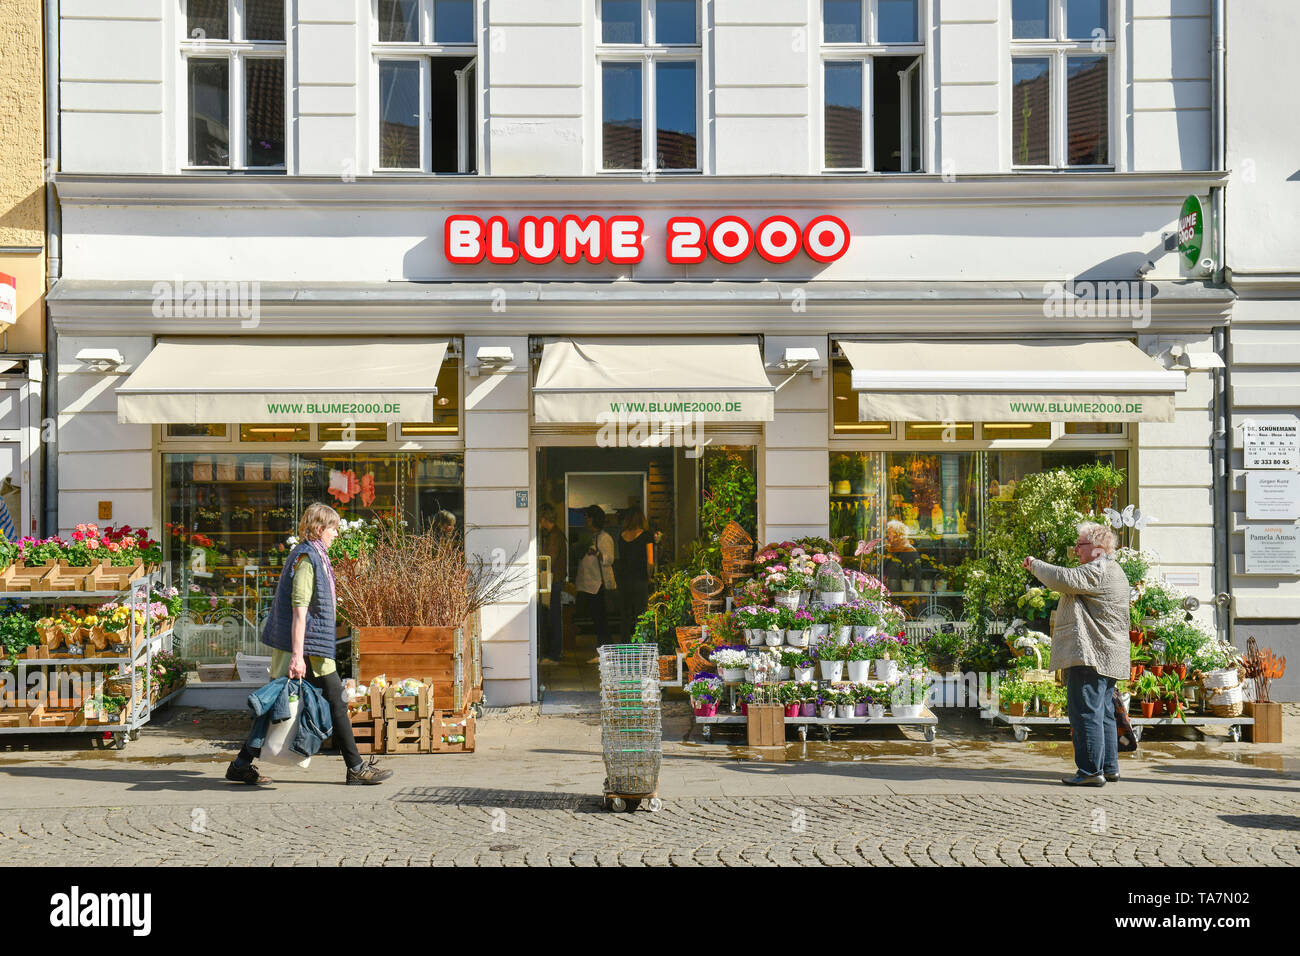 Flower in 2000, Carl apron street, Old Town, Spandau, Berlin, Germany, Blume 2000, Carl-Schurz-Straße, Altstadt, Deutschland - Stock Image